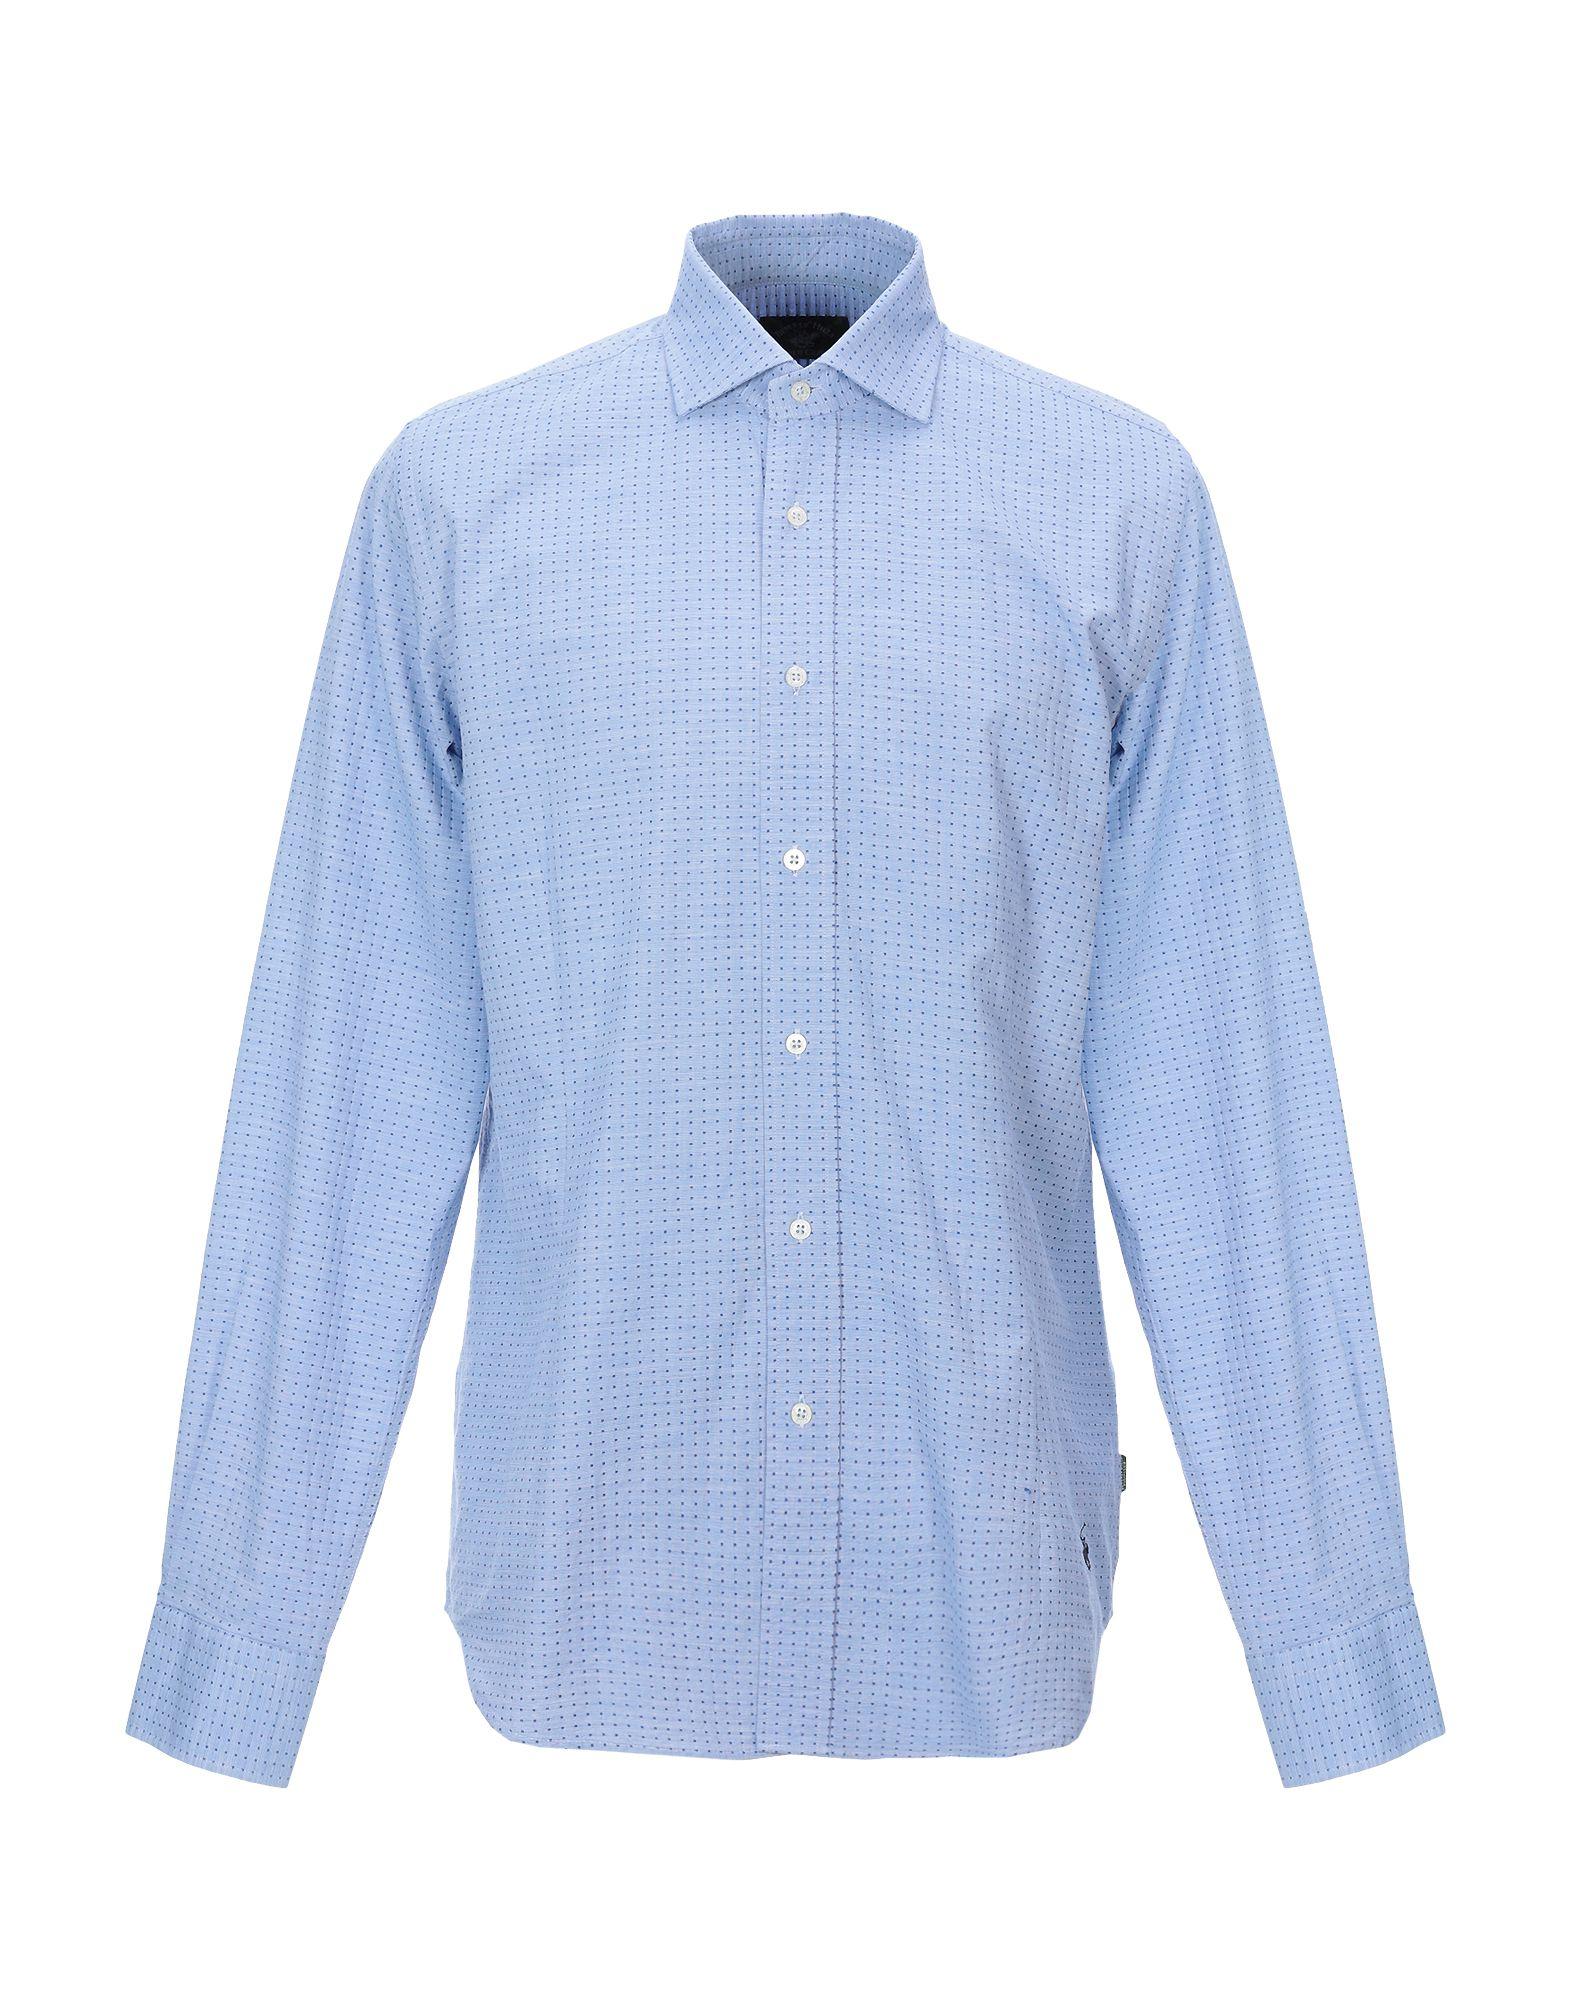 BEVERLY HILLS POLO CLUB Pубашка цены онлайн